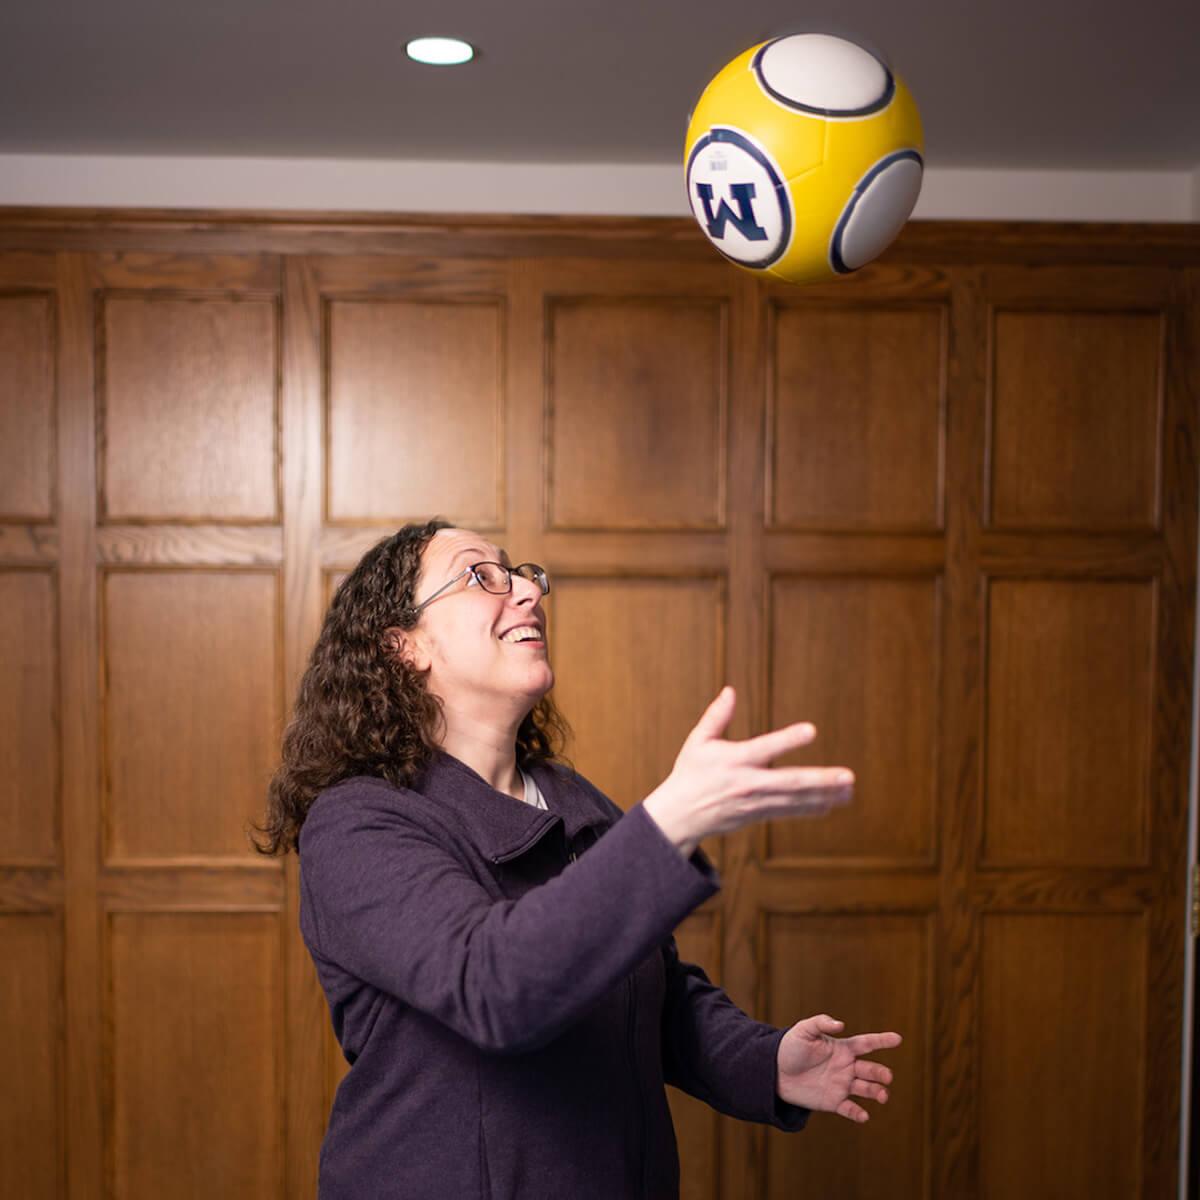 Helene Fligiel, preventive medicine resident, University of Michigan School of Public Health, tosses a soccer ball